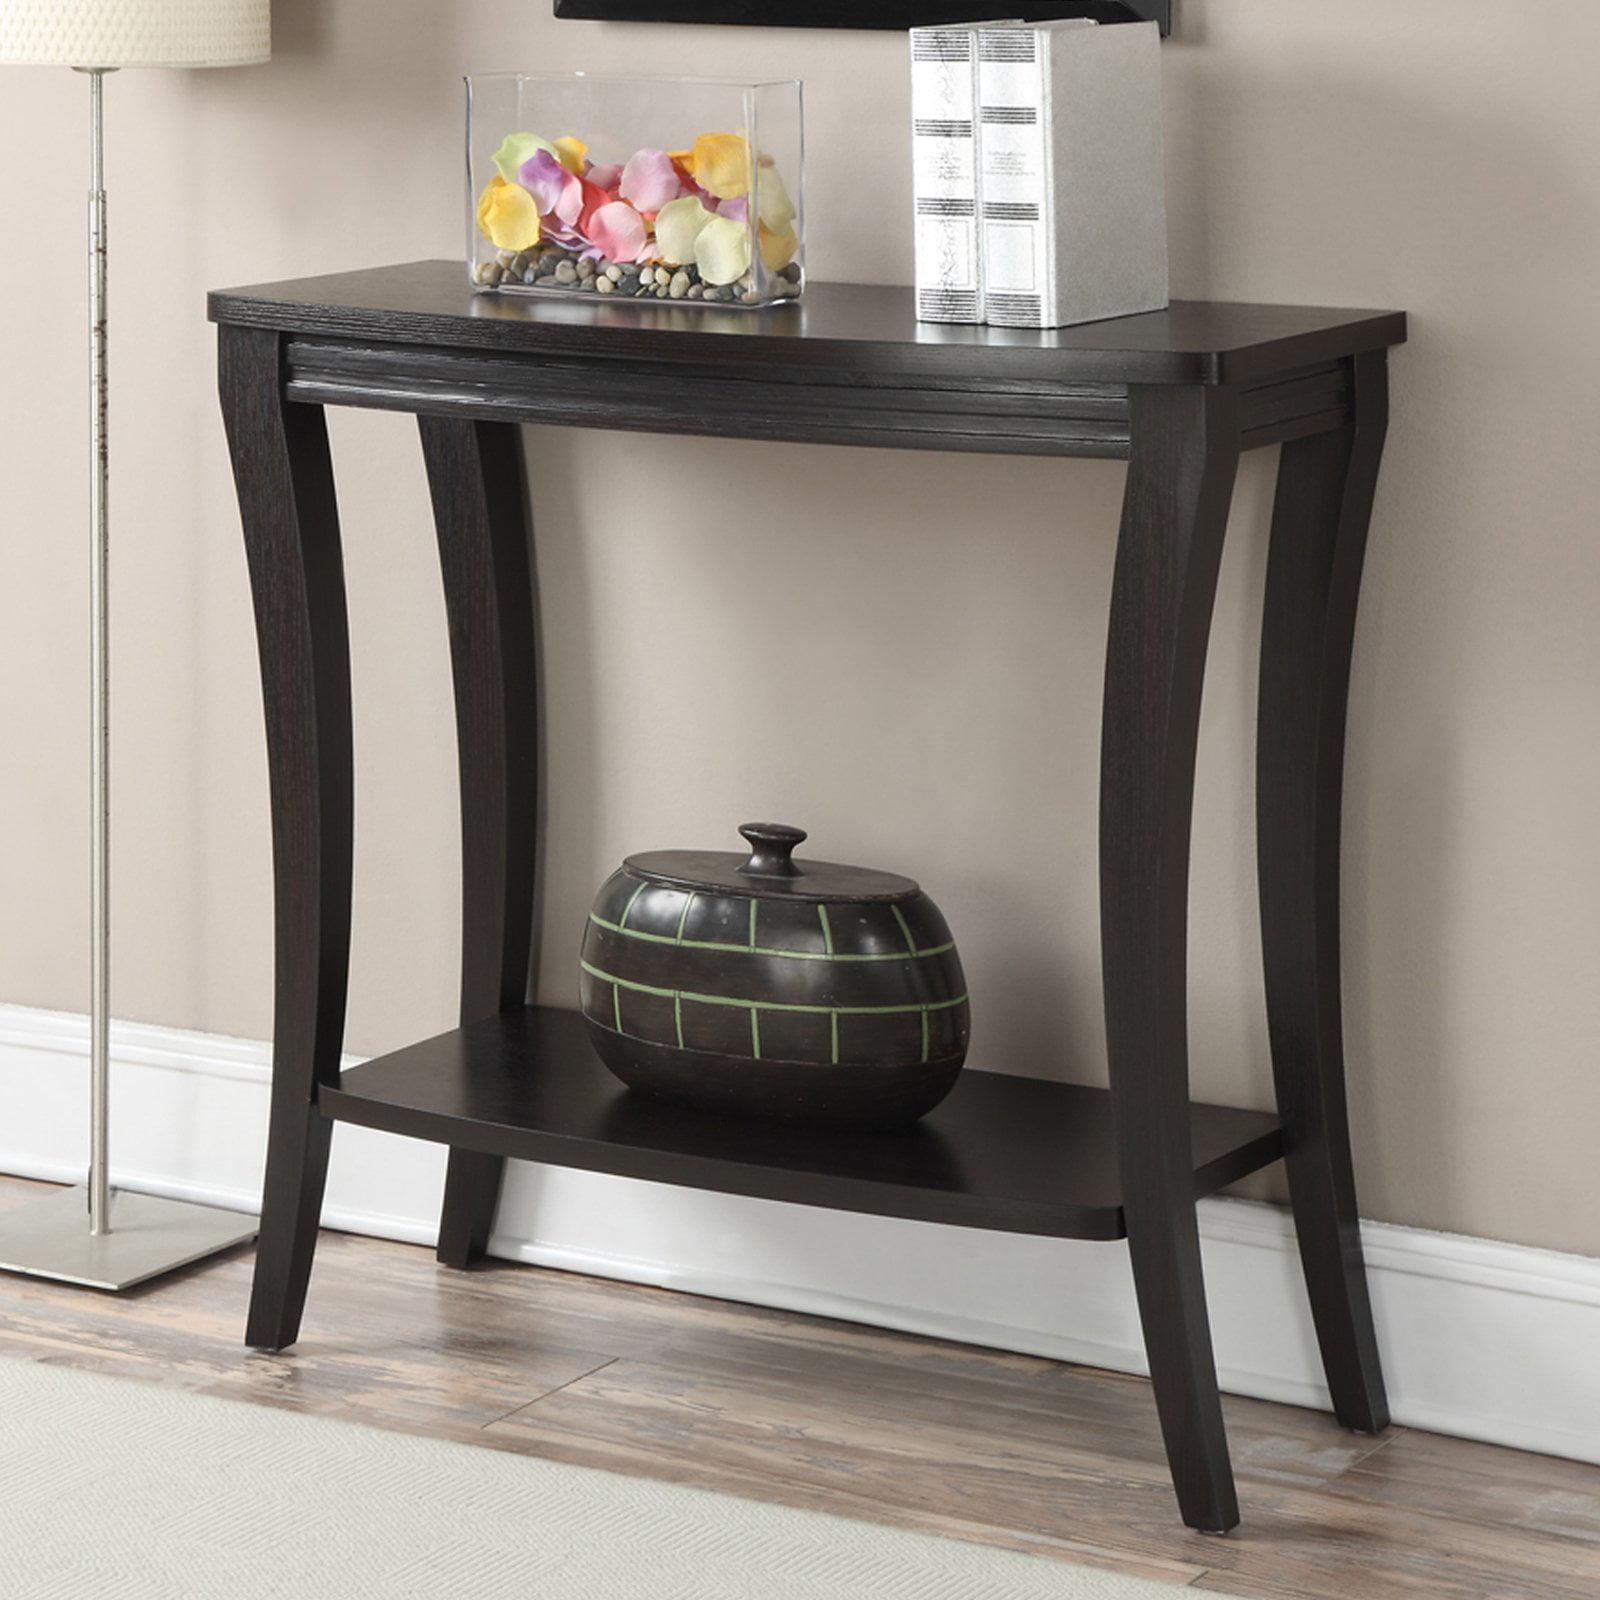 Convenience Concepts Newport Console Table with Shelf, Espresso